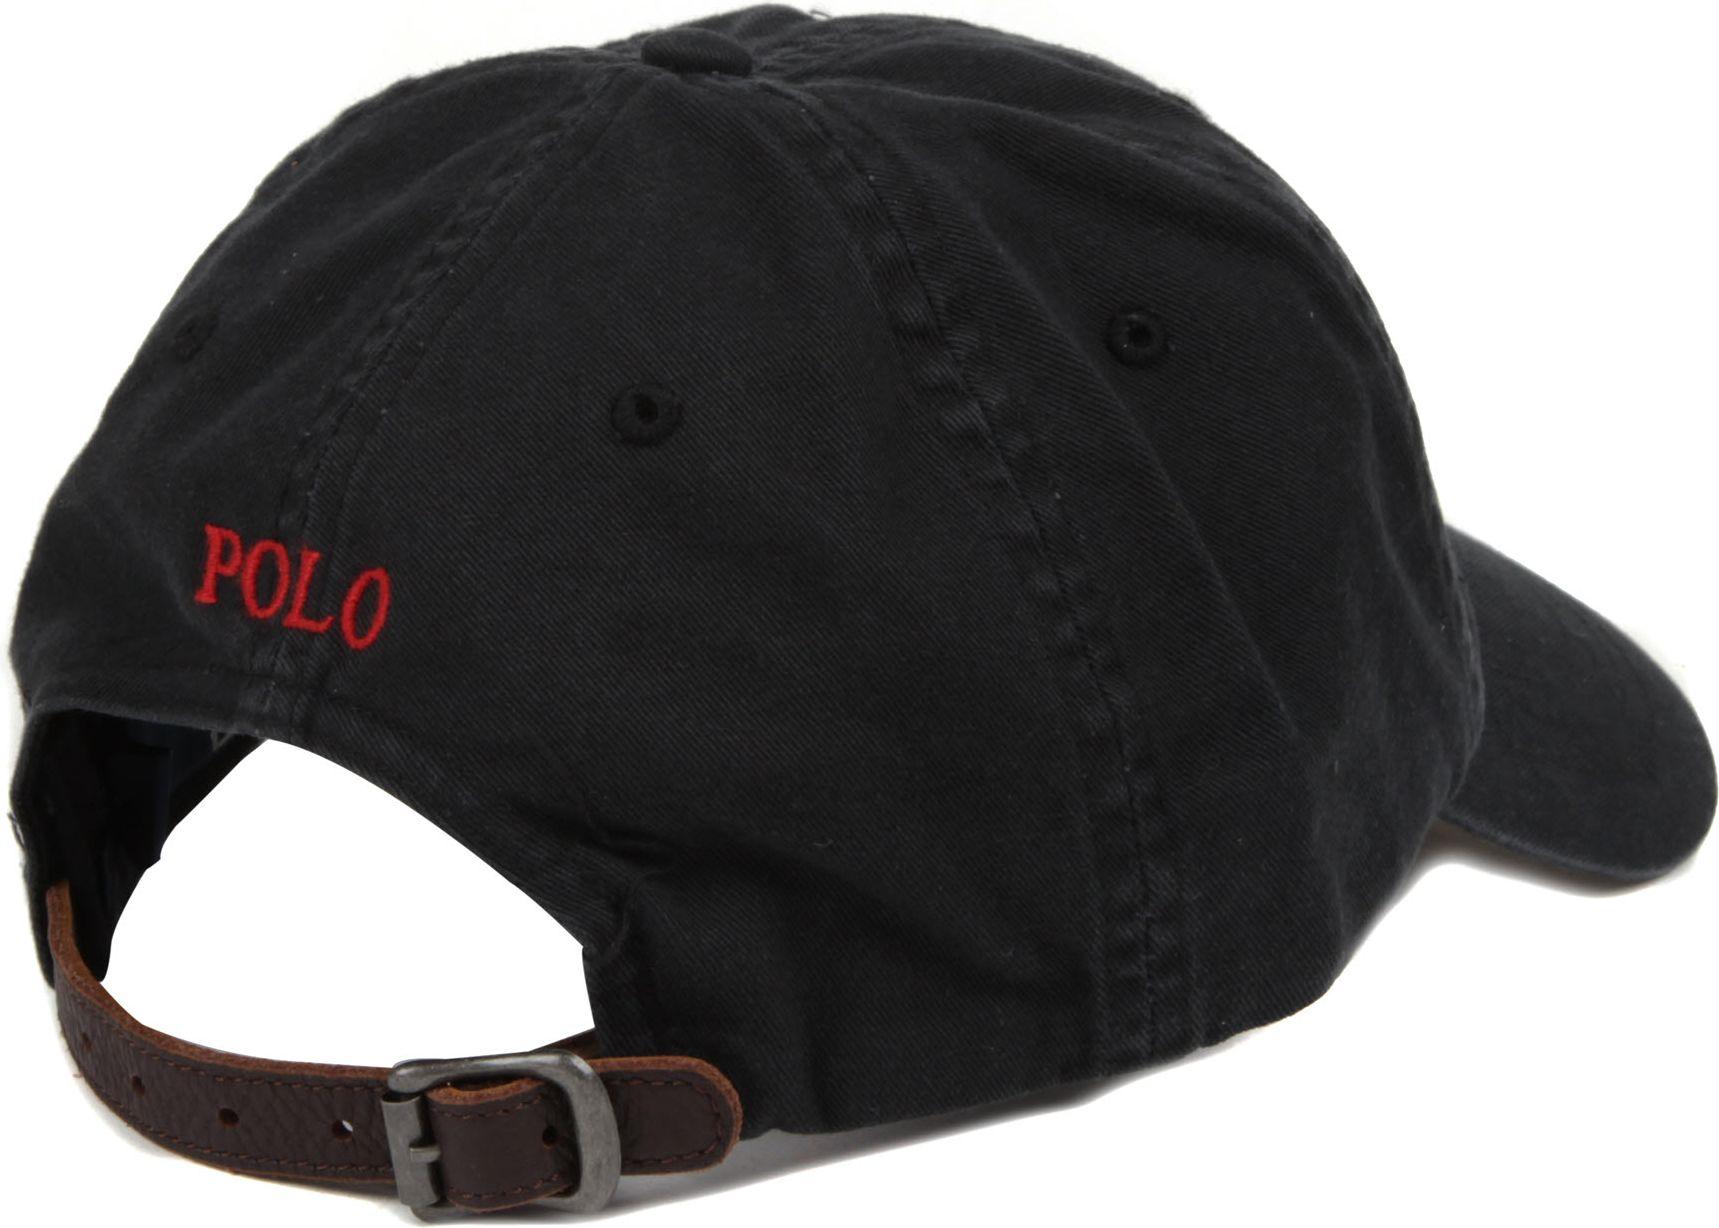 ralph lauren signature pony baseball cap in black for men lyst. Black Bedroom Furniture Sets. Home Design Ideas